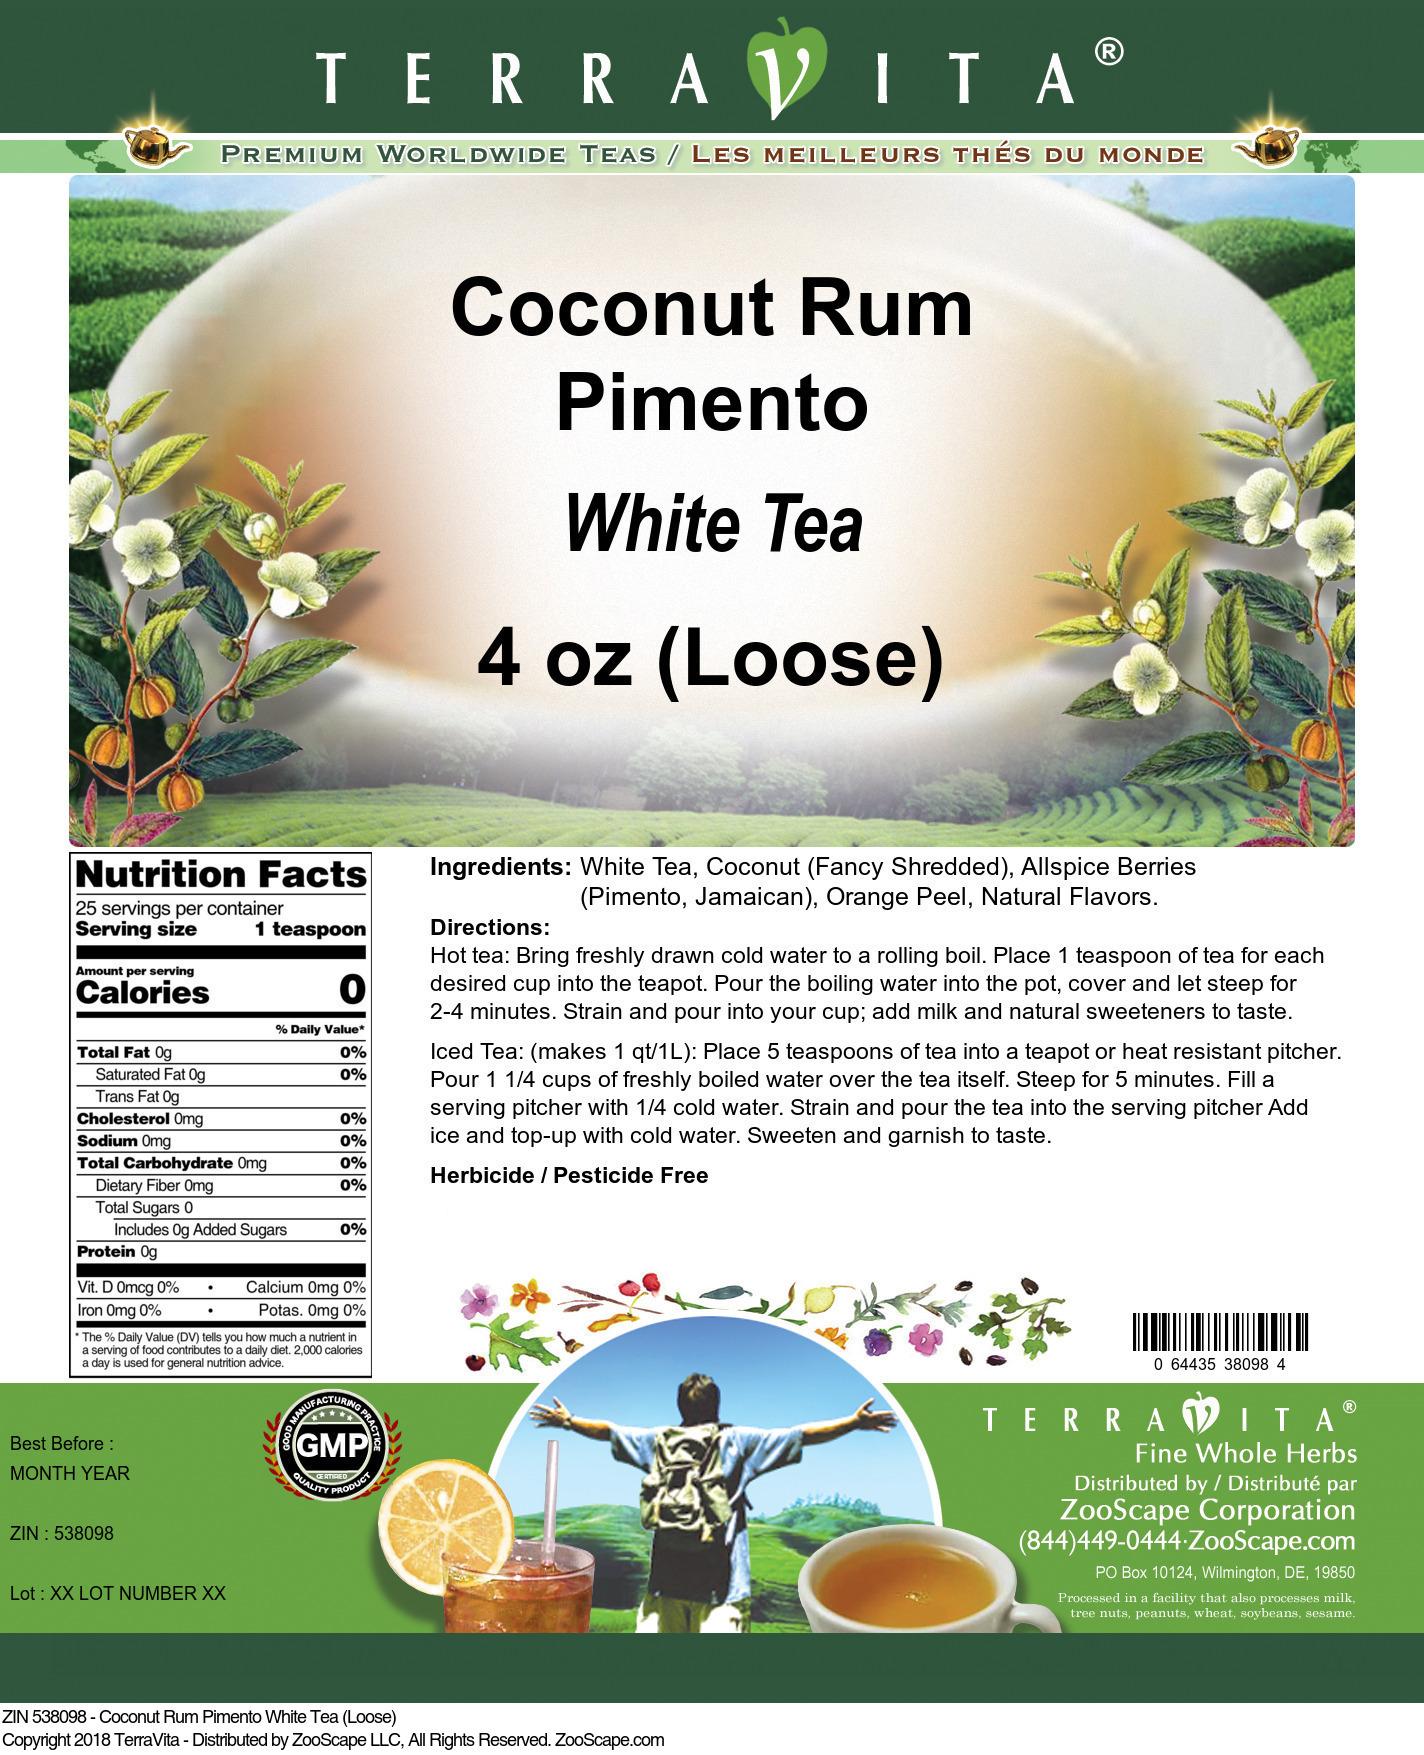 Coconut Rum Pimento White Tea (Loose)